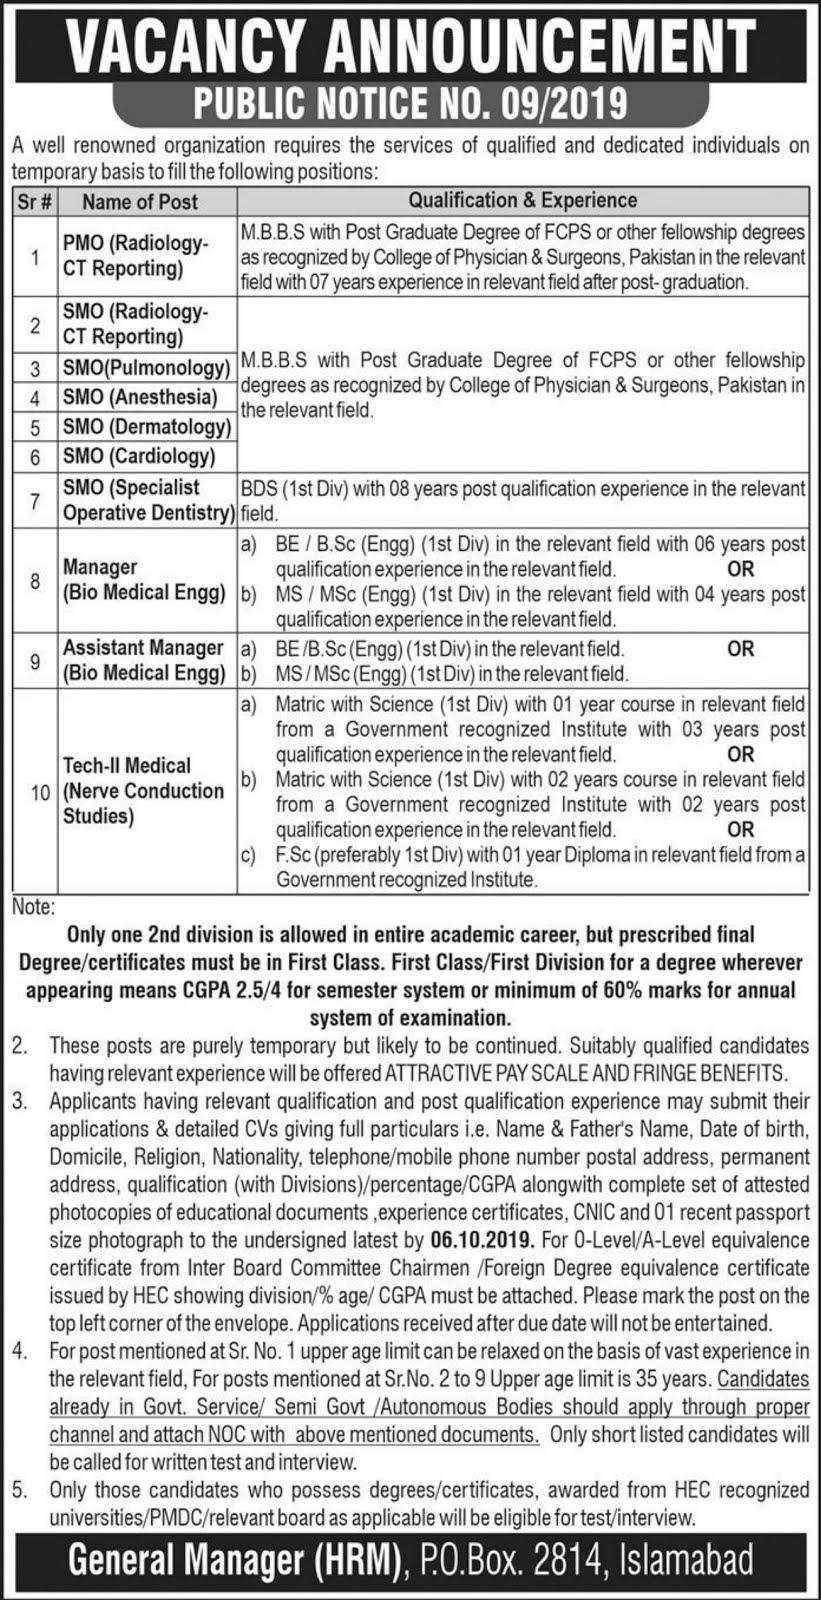 P.O.Box 2814 Islamabad Jobs 2019 Public Sector Organization